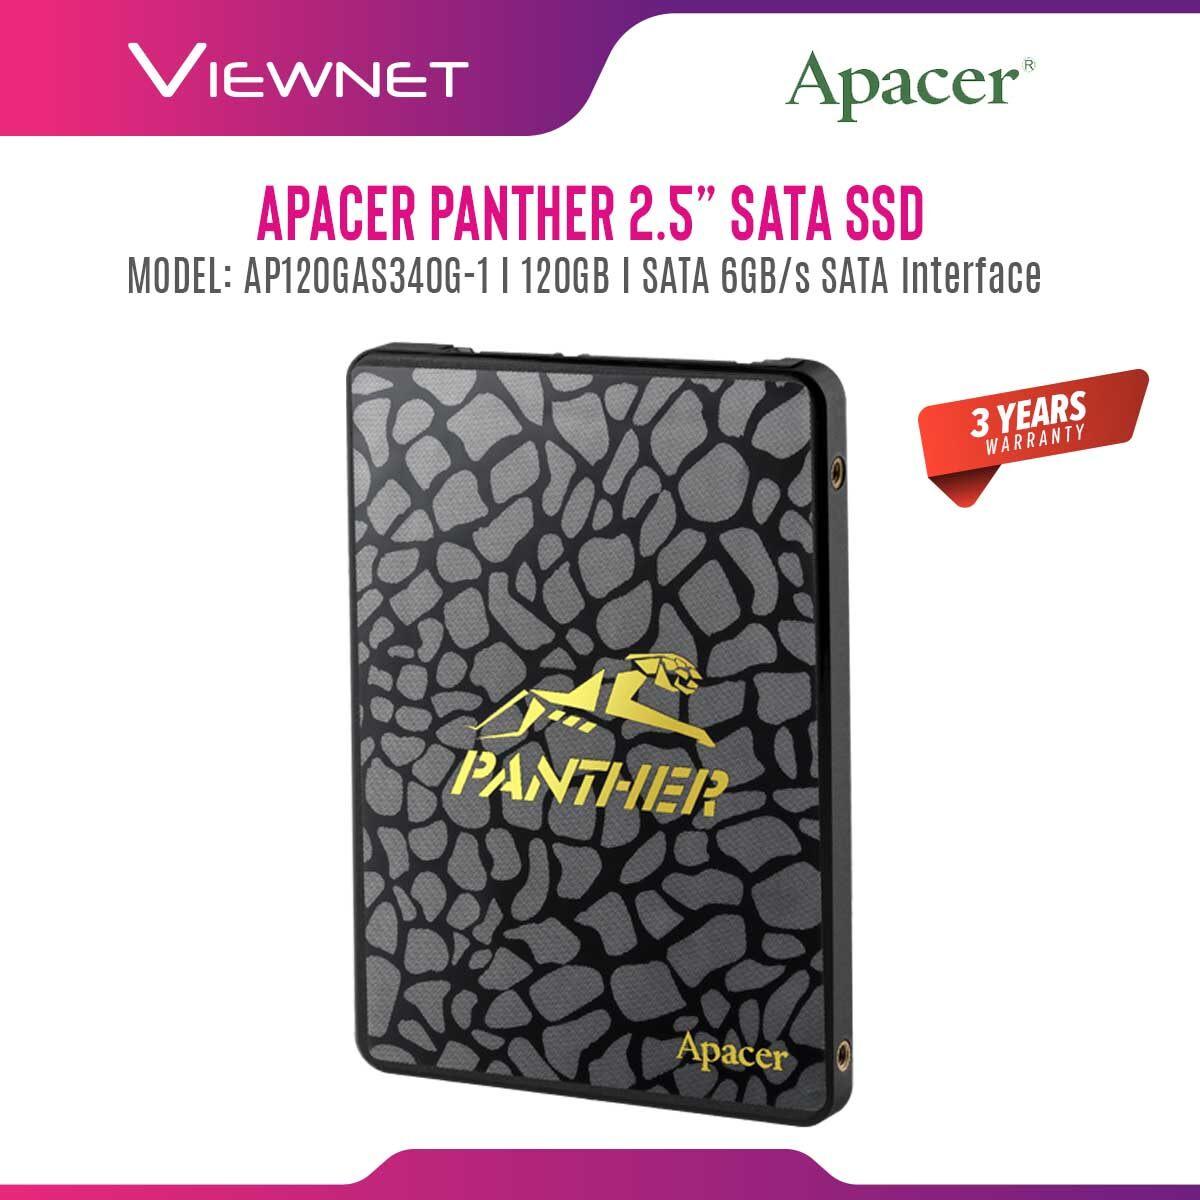 Apacer AS340 Panther (120GB/240GB/480GB/960GB) & AS350X (128GB/256GB/512GB/1TB) 2.5